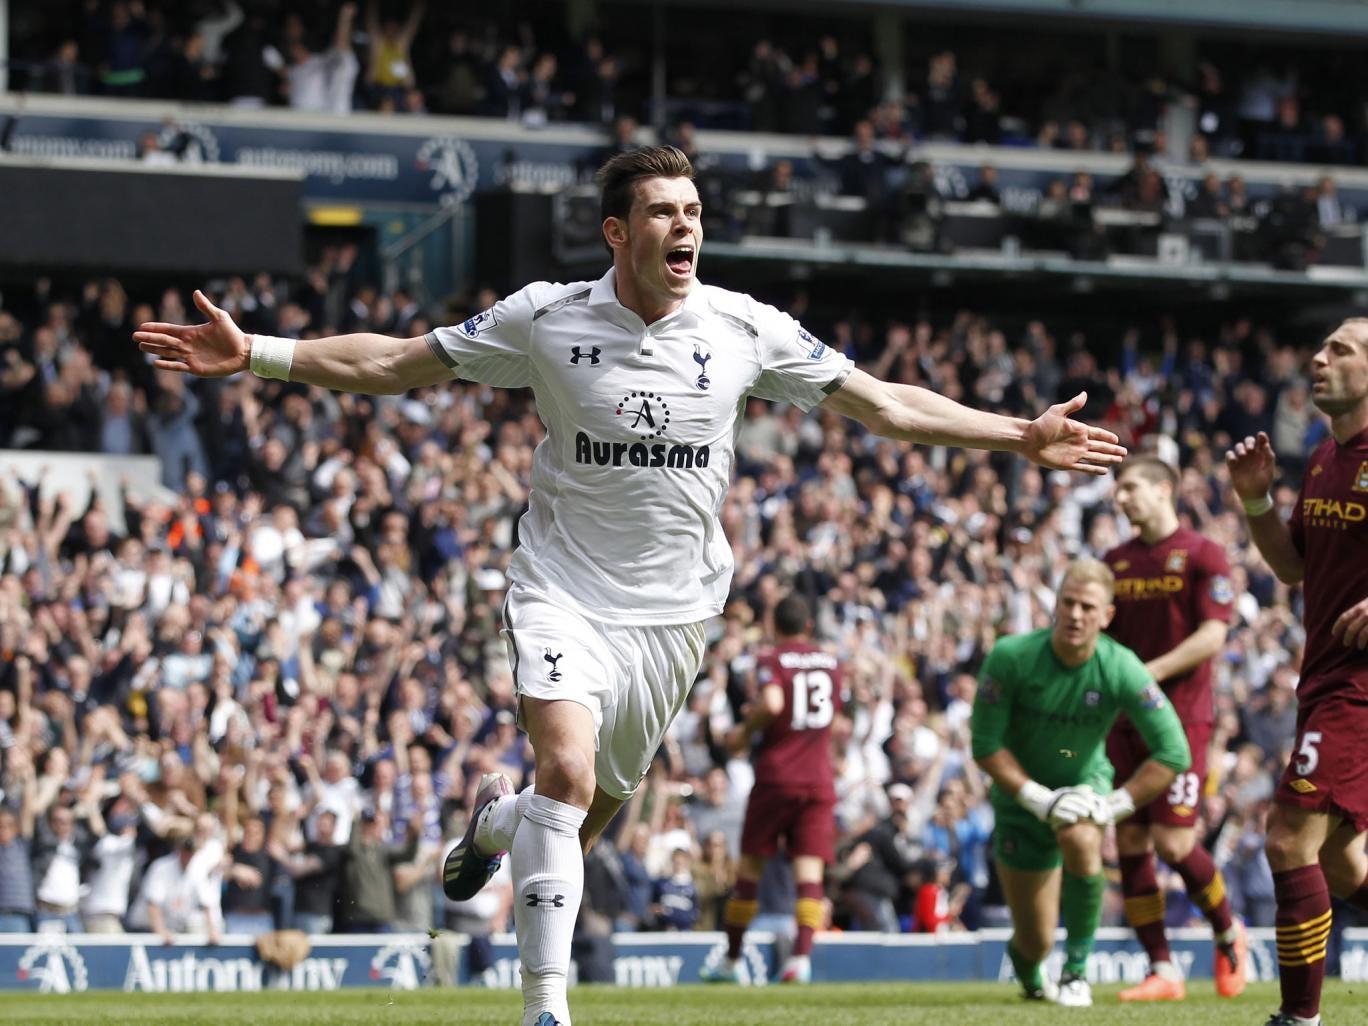 Gareth Bale celebrates his goal for Tottenham